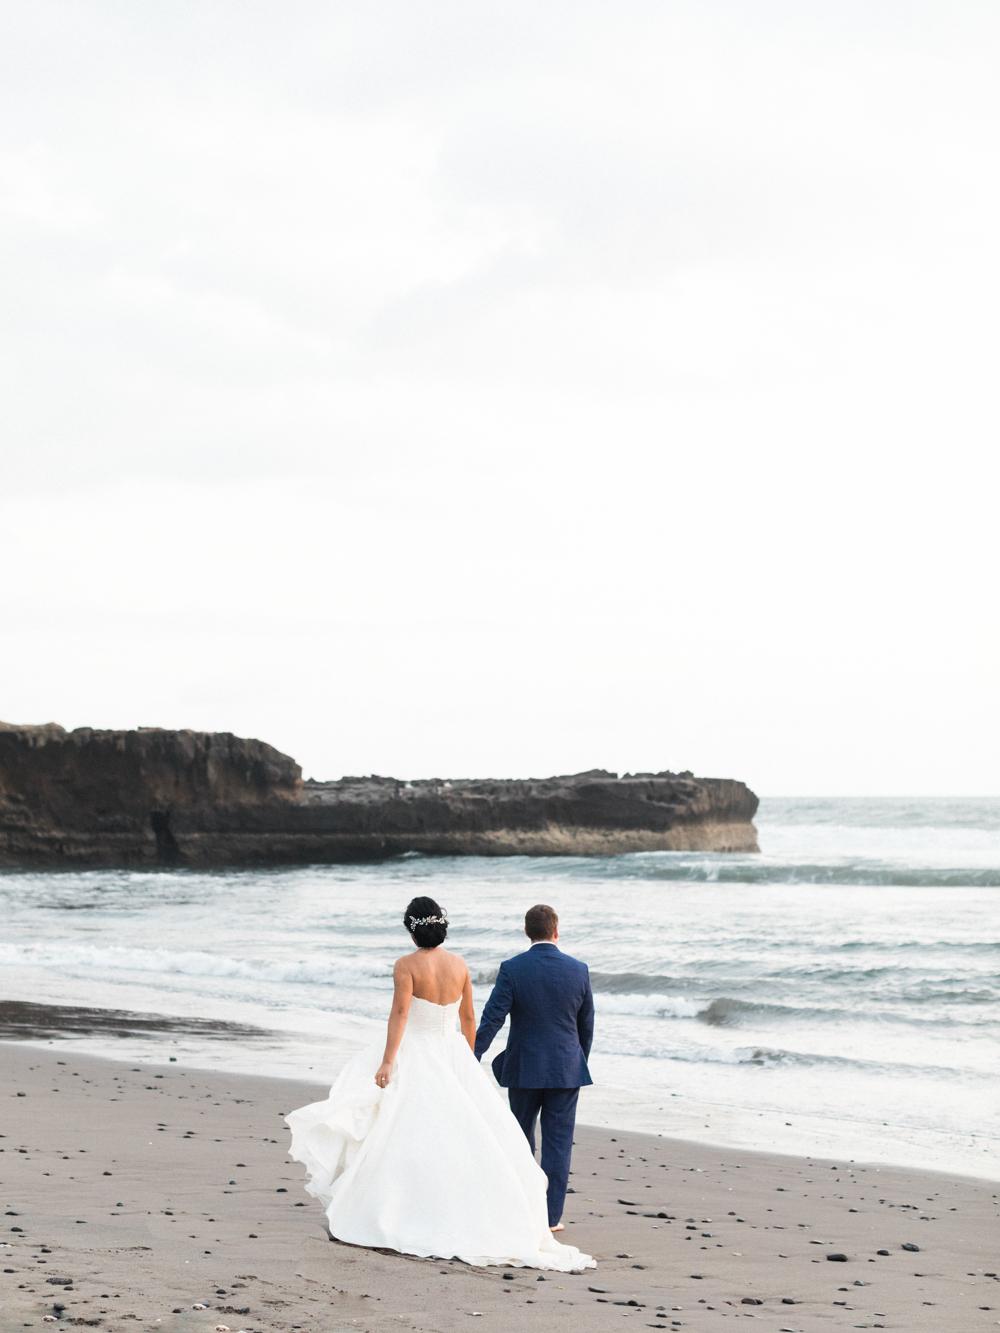 Bali_Real_Wedding_(c)_Rory_Wylie-109.jpg